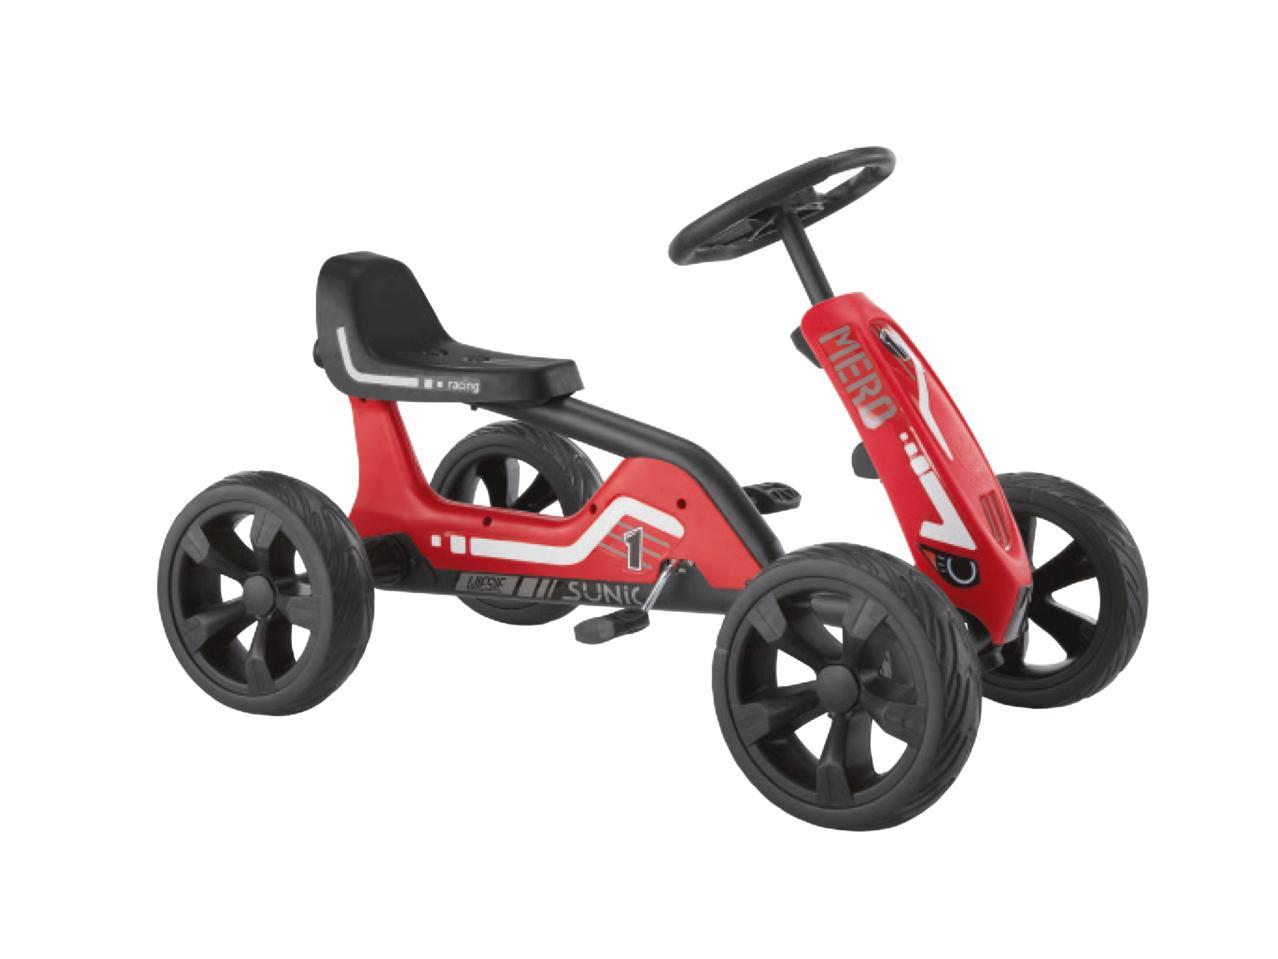 Playtive Junior Kids Go Kart Lidl Ireland Specials Archive